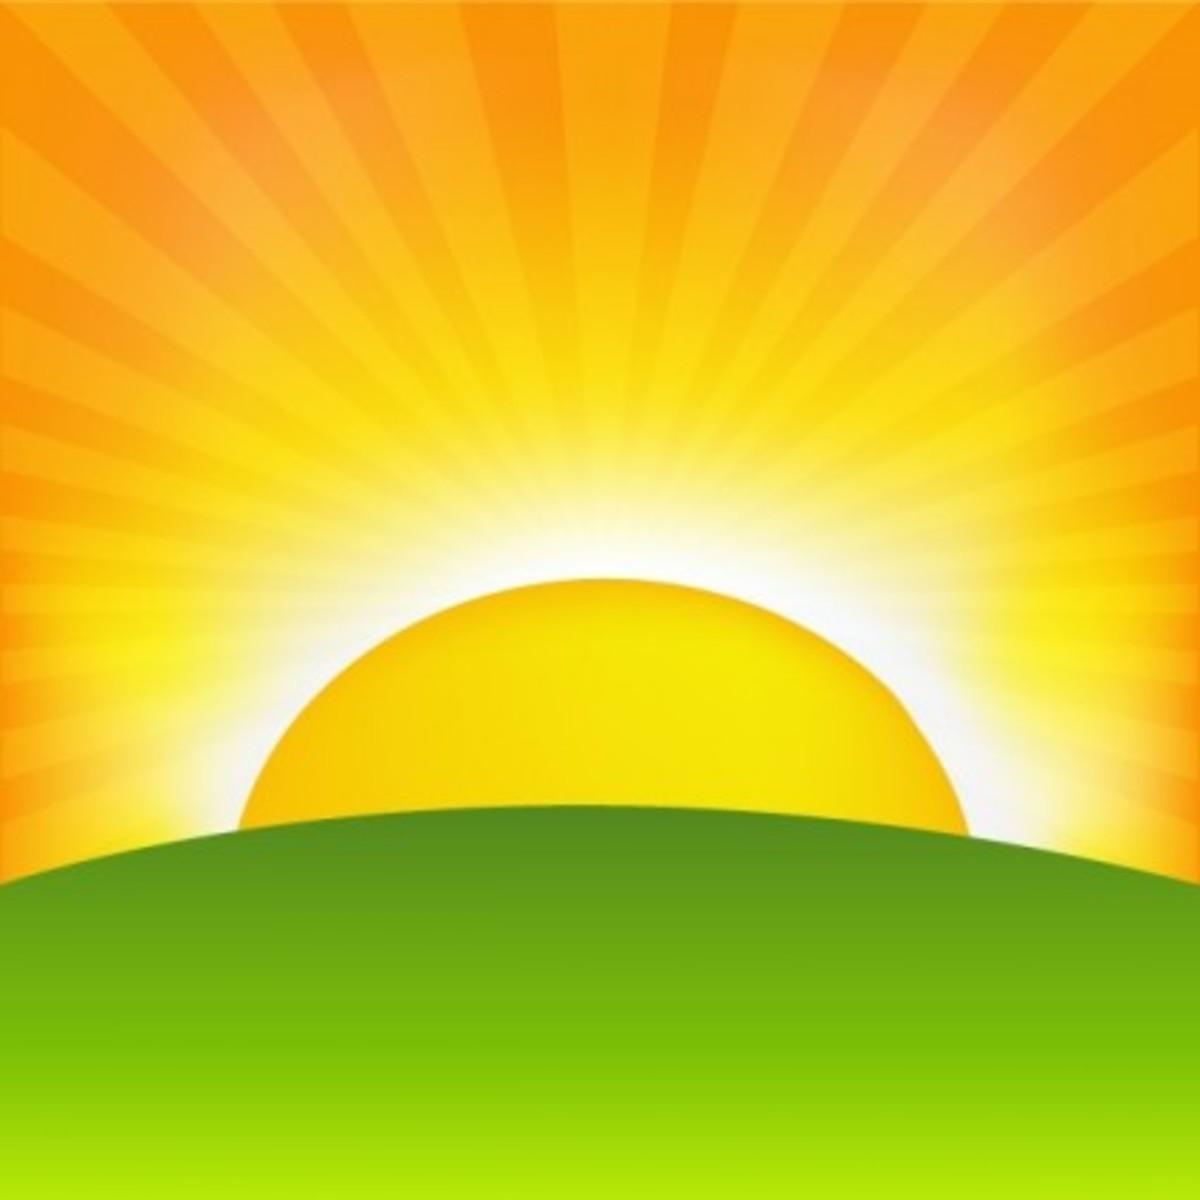 Sunrise clip art